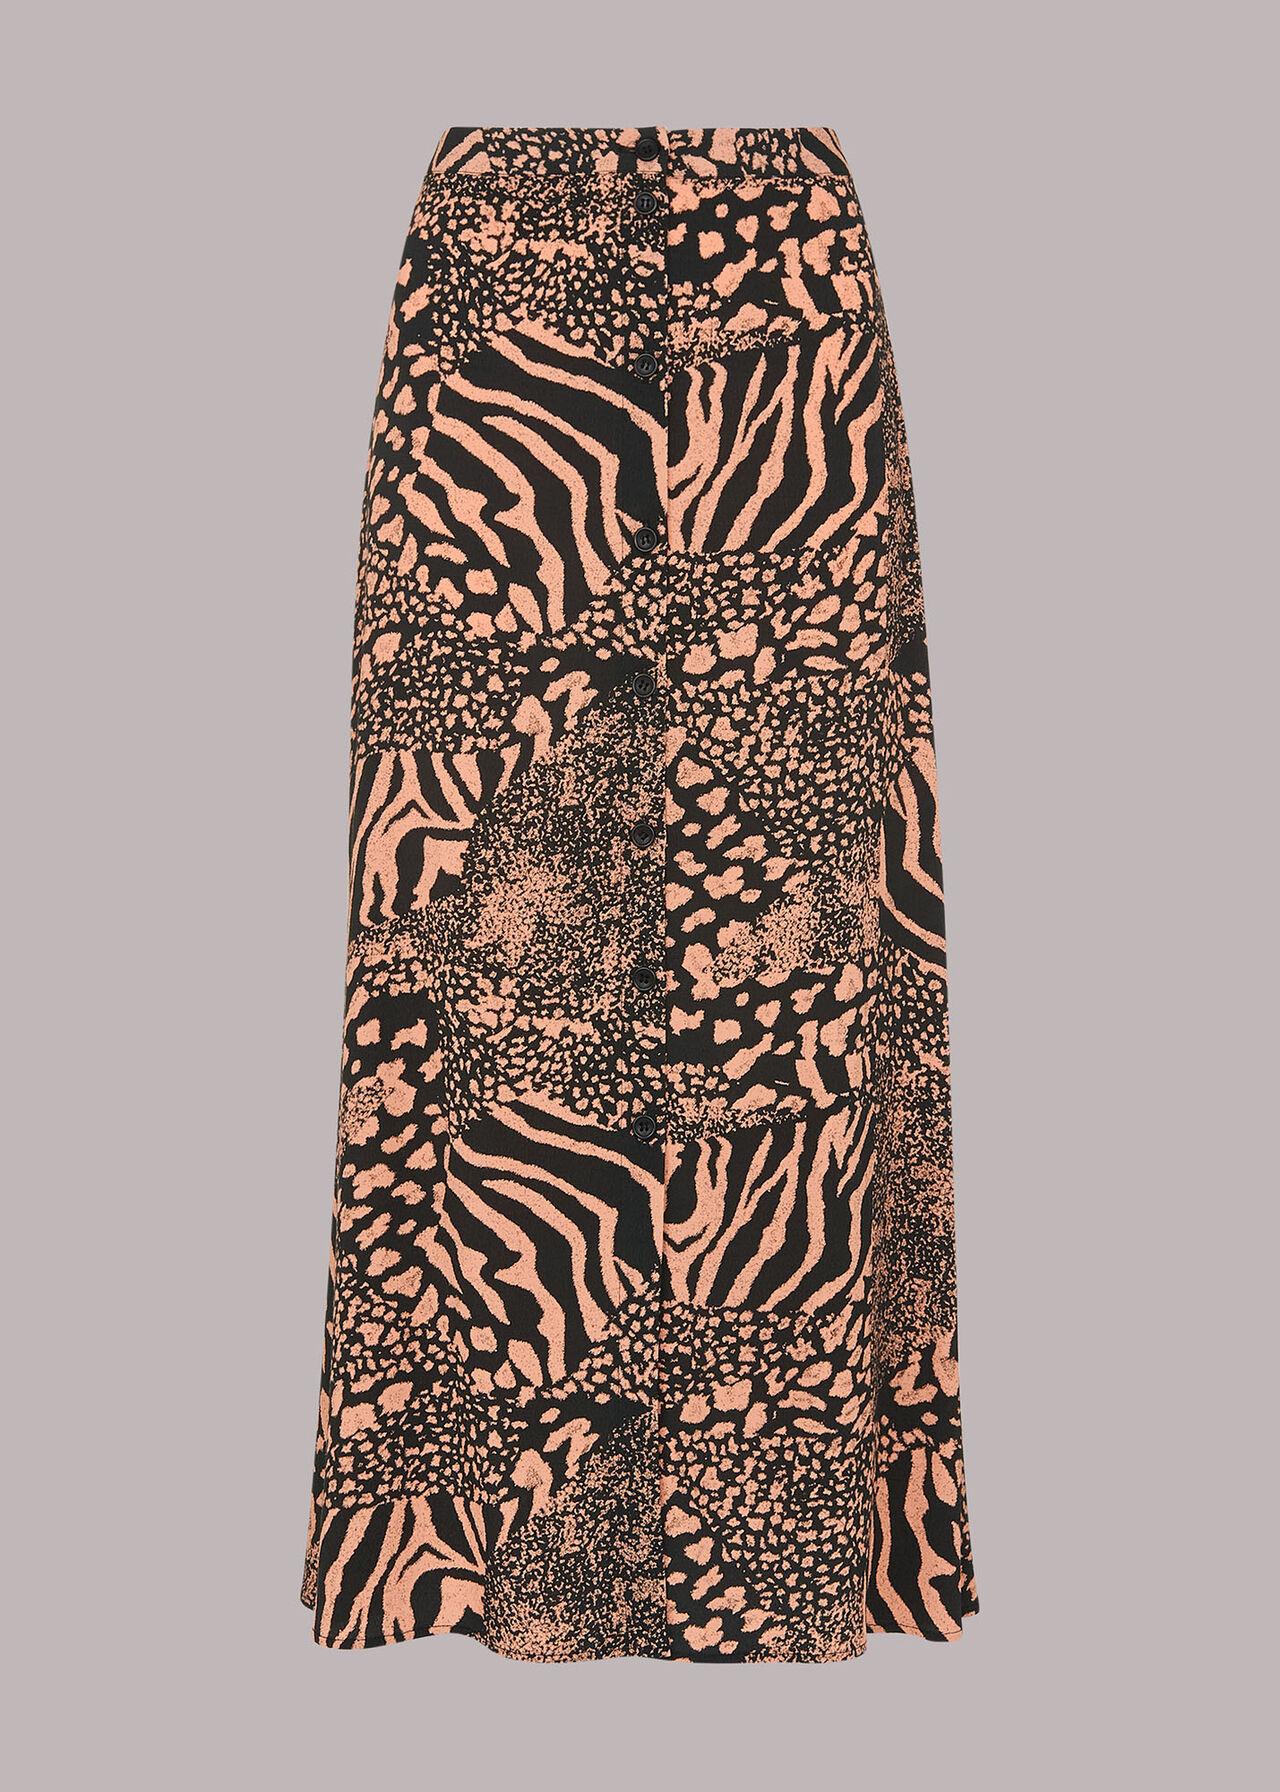 Patchwork Animal Button Skirt